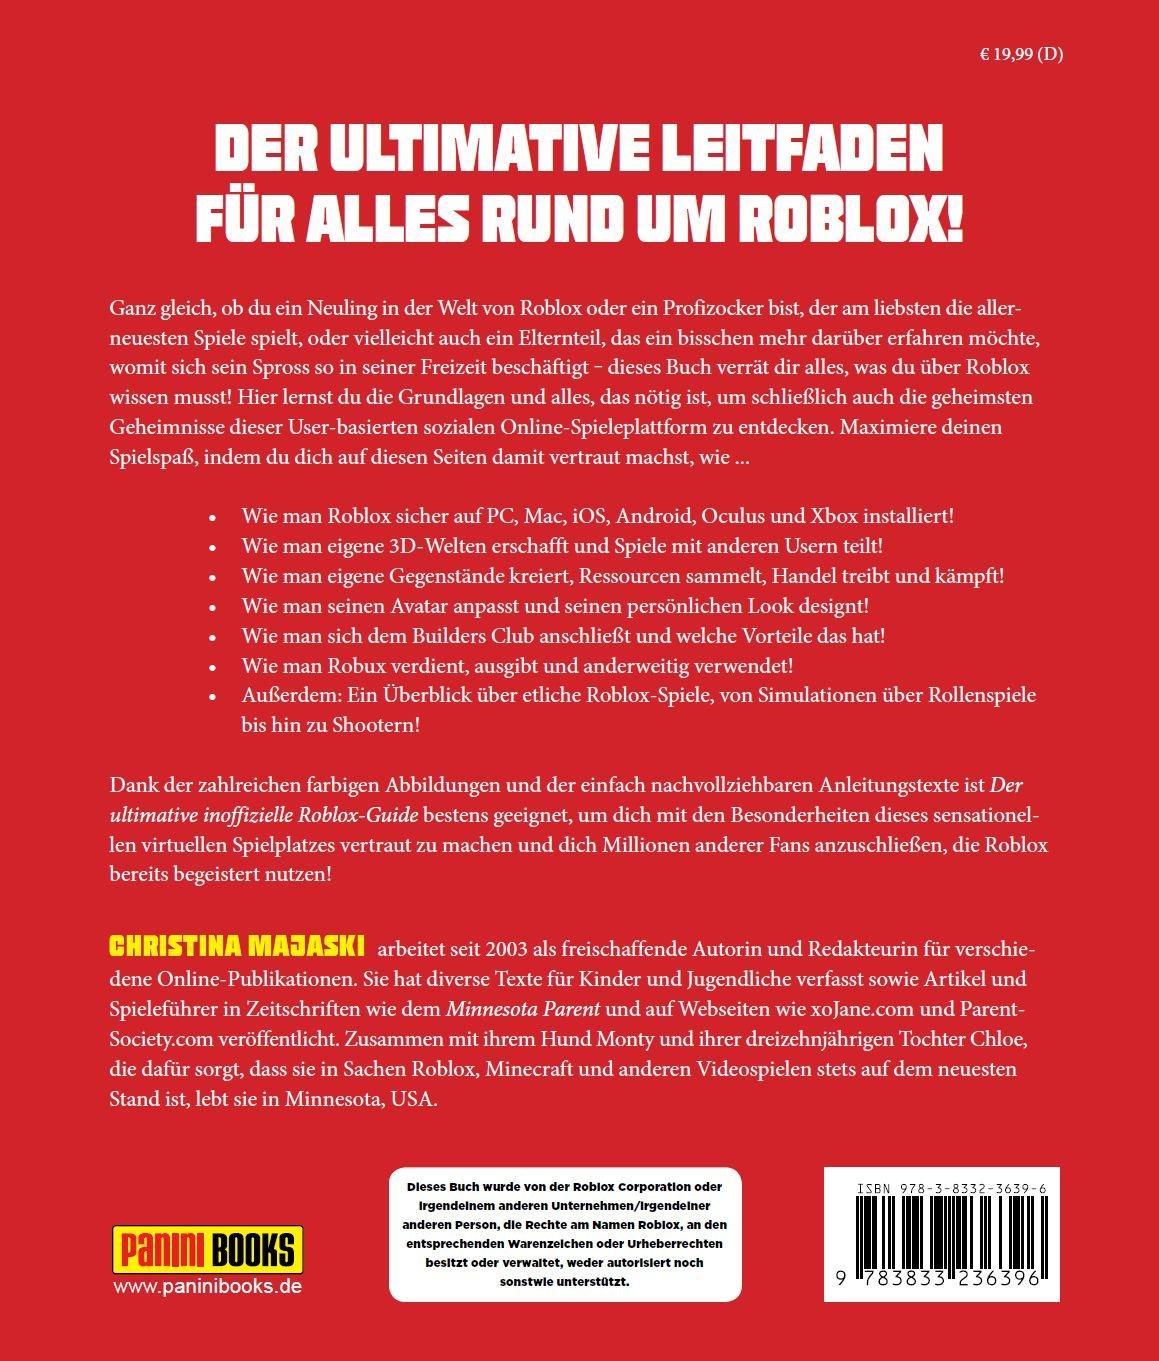 Der ultimative inoffizielle Roblox-Guide: 9783833236396: Amazon.com ...